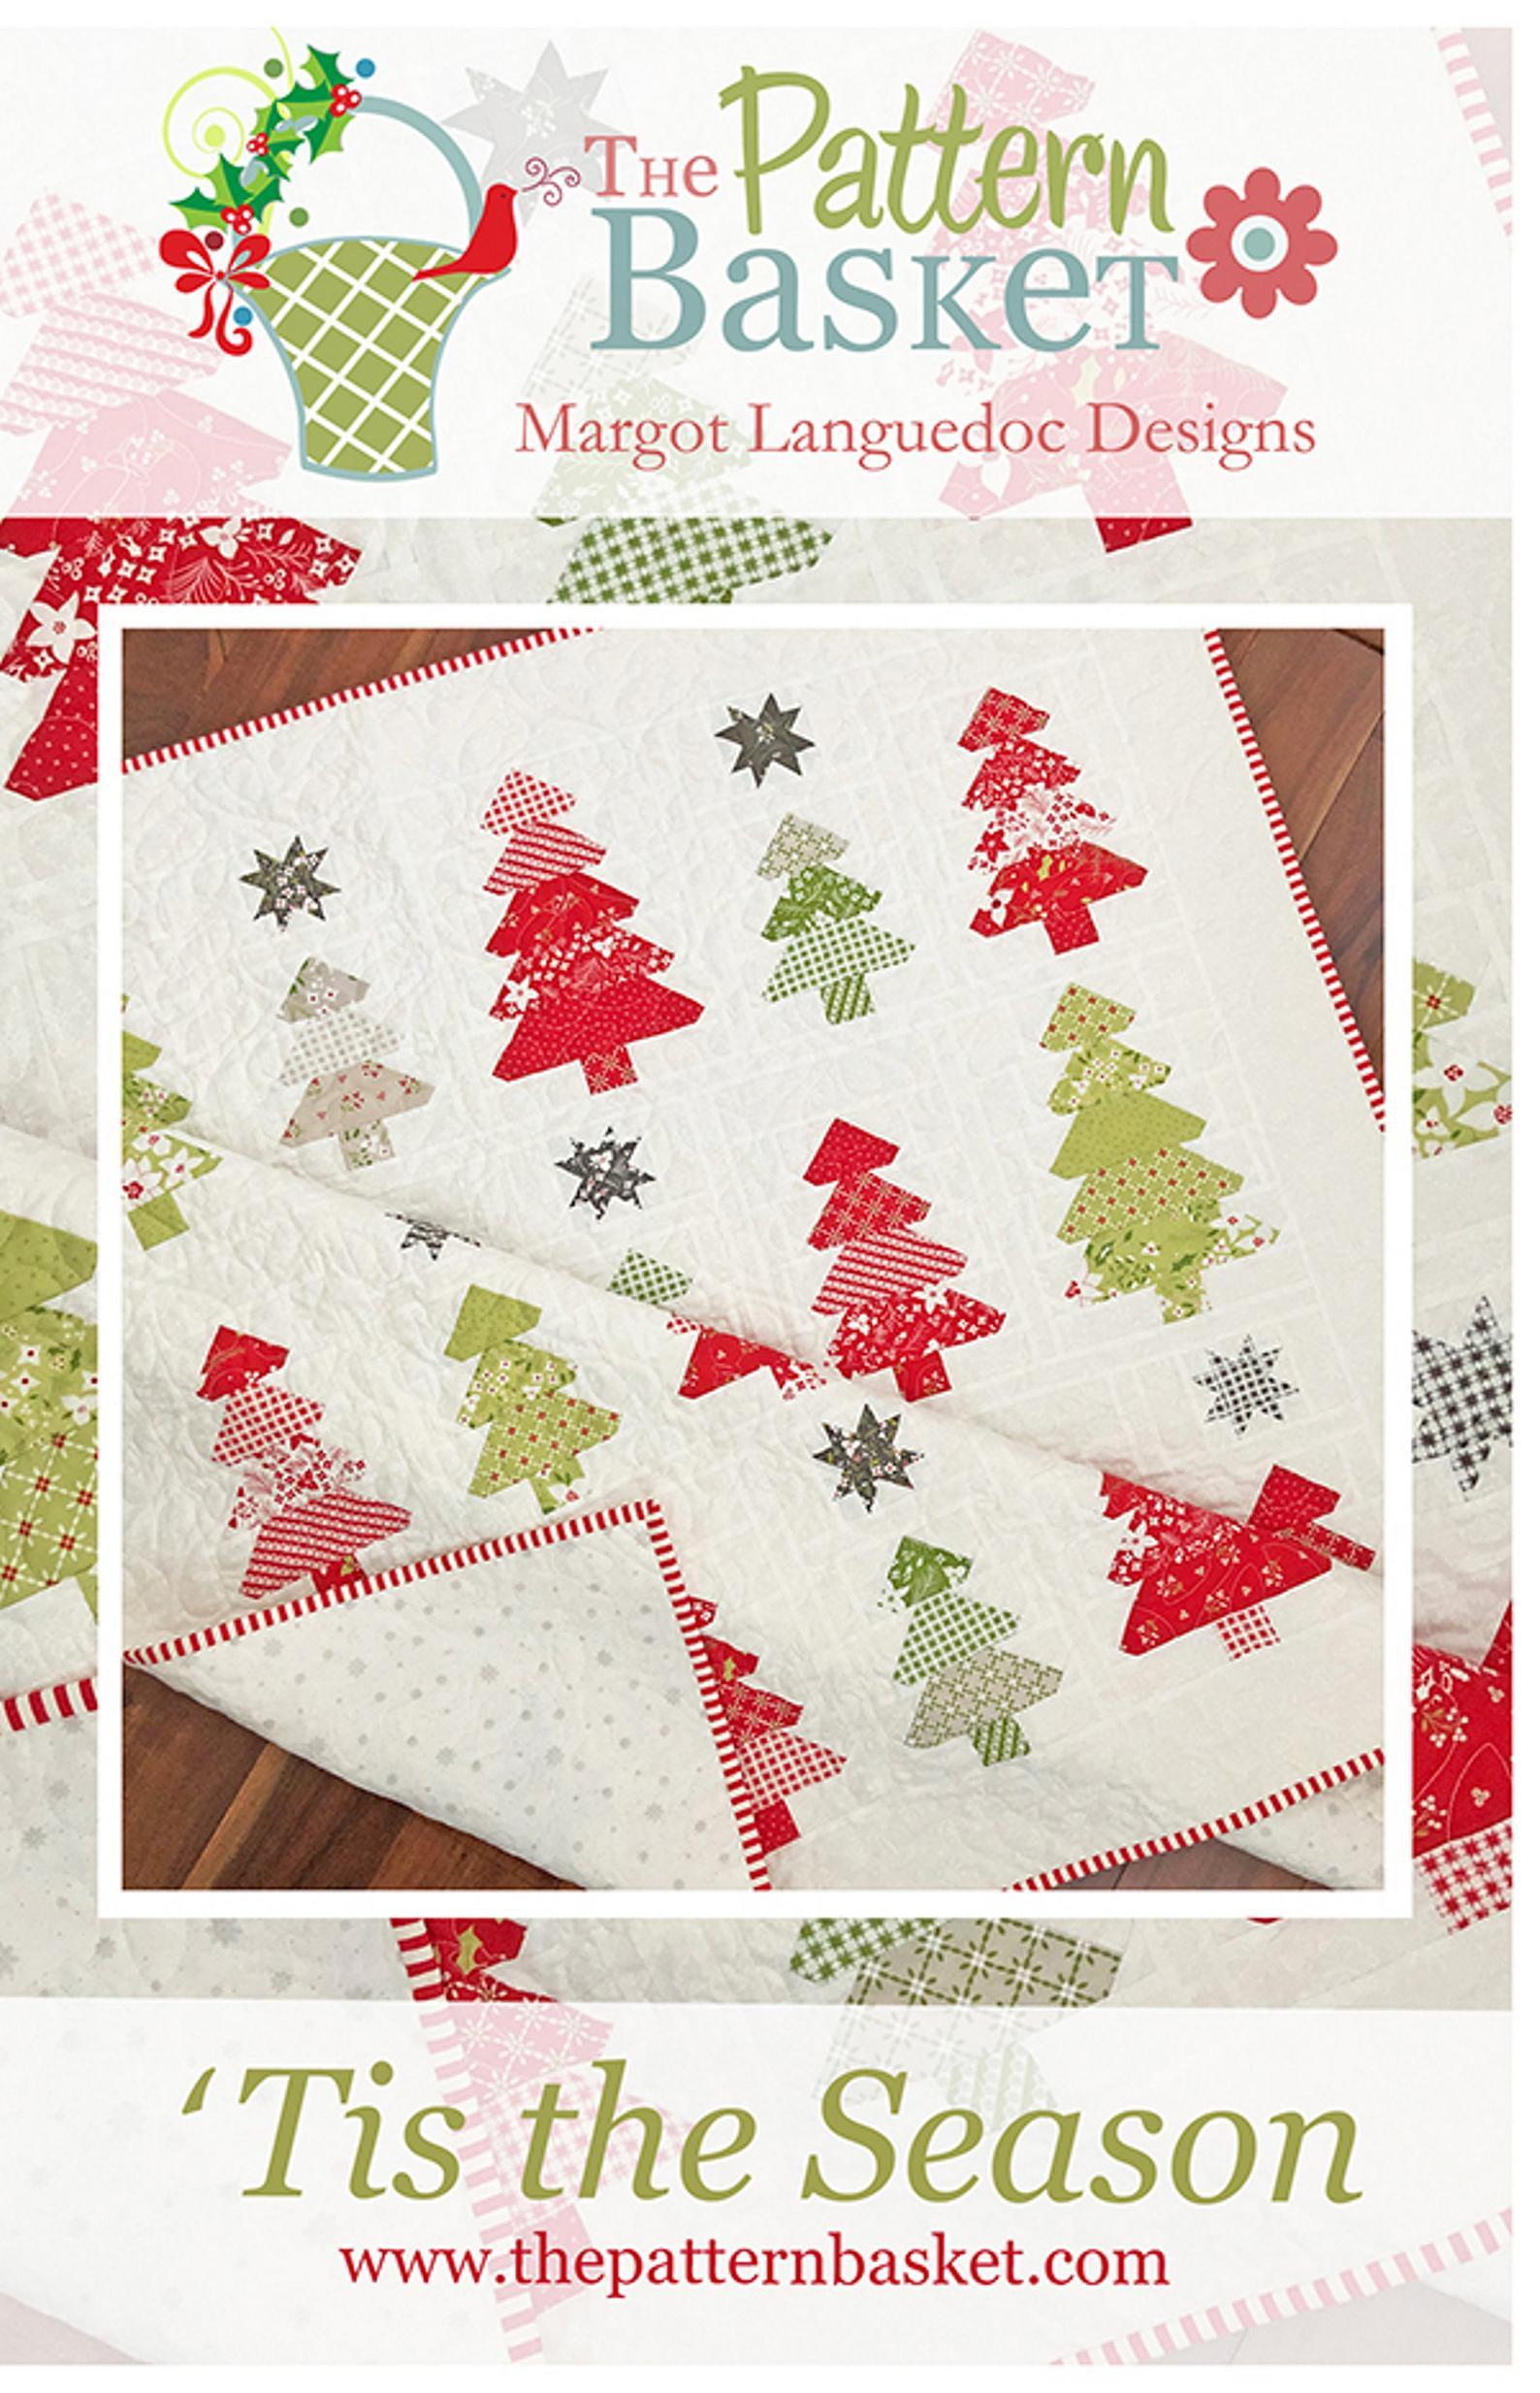 Tis the Season Quilt Pattern by The Pattern Basket Margot Languedoc